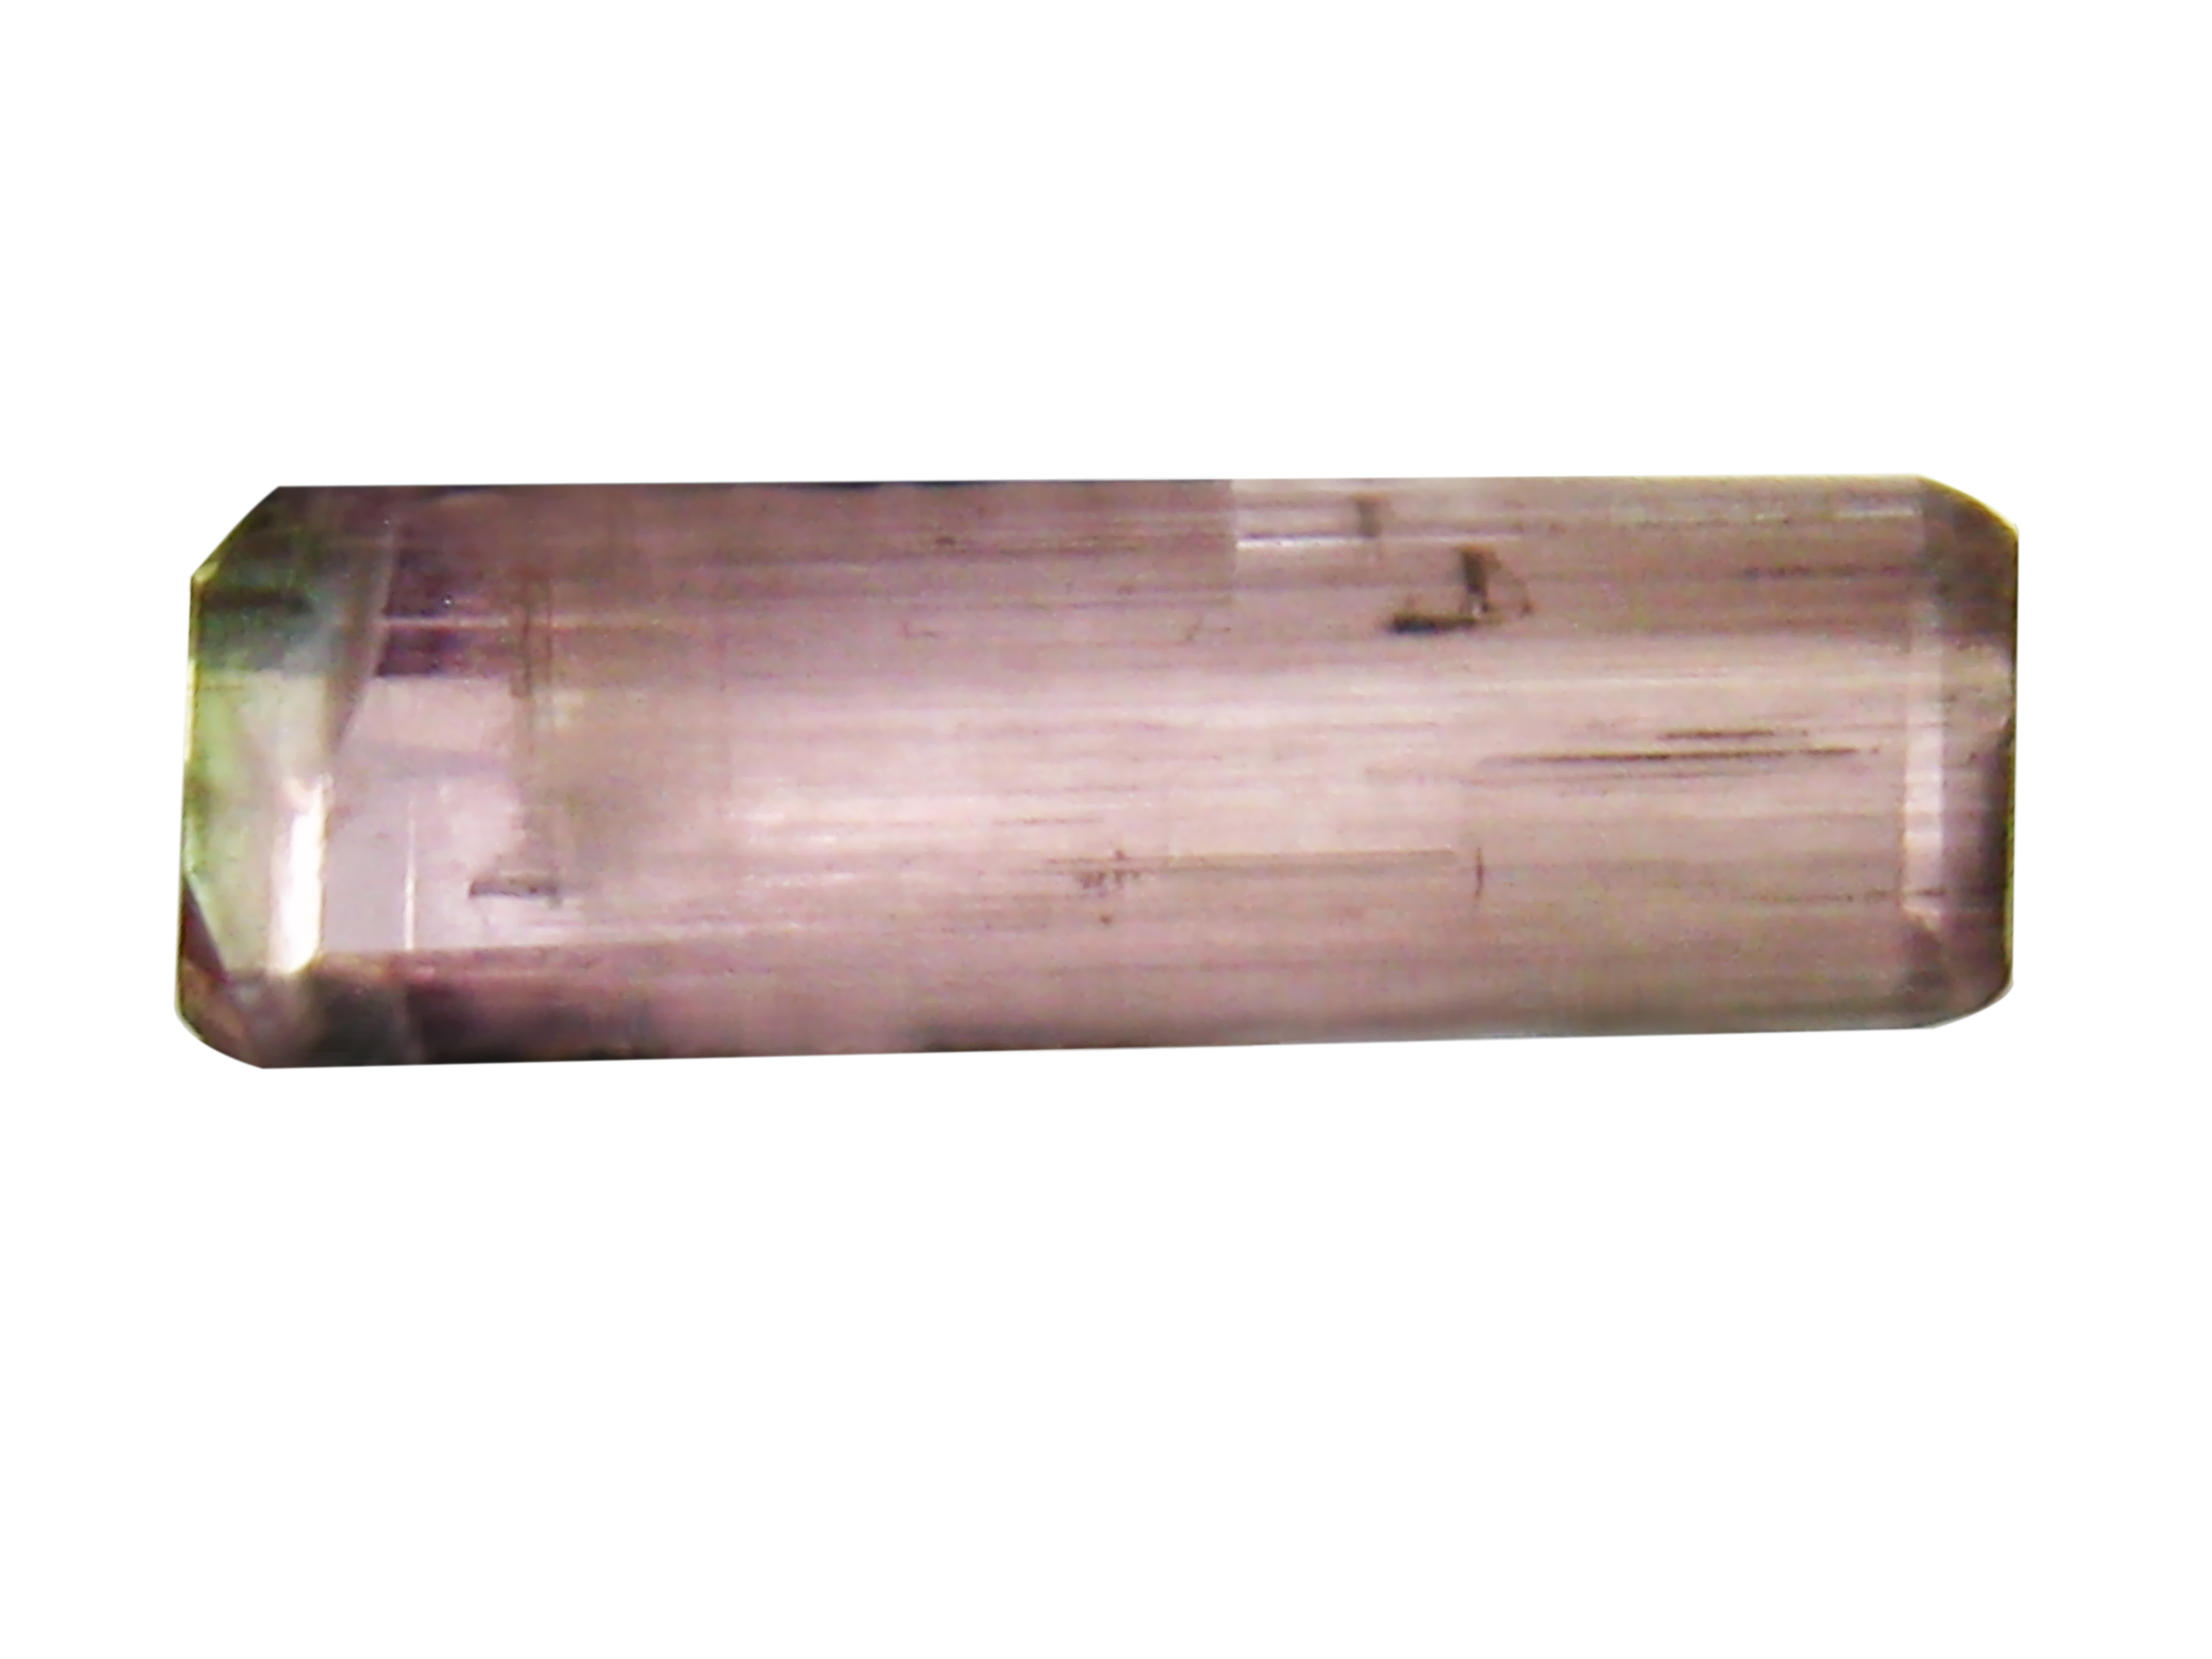 1.29 ct AAA+ Topnotch Octagon Shape (12 x 3 mm) Bi Color Bi-Color Tourmaline Natural Gemstone